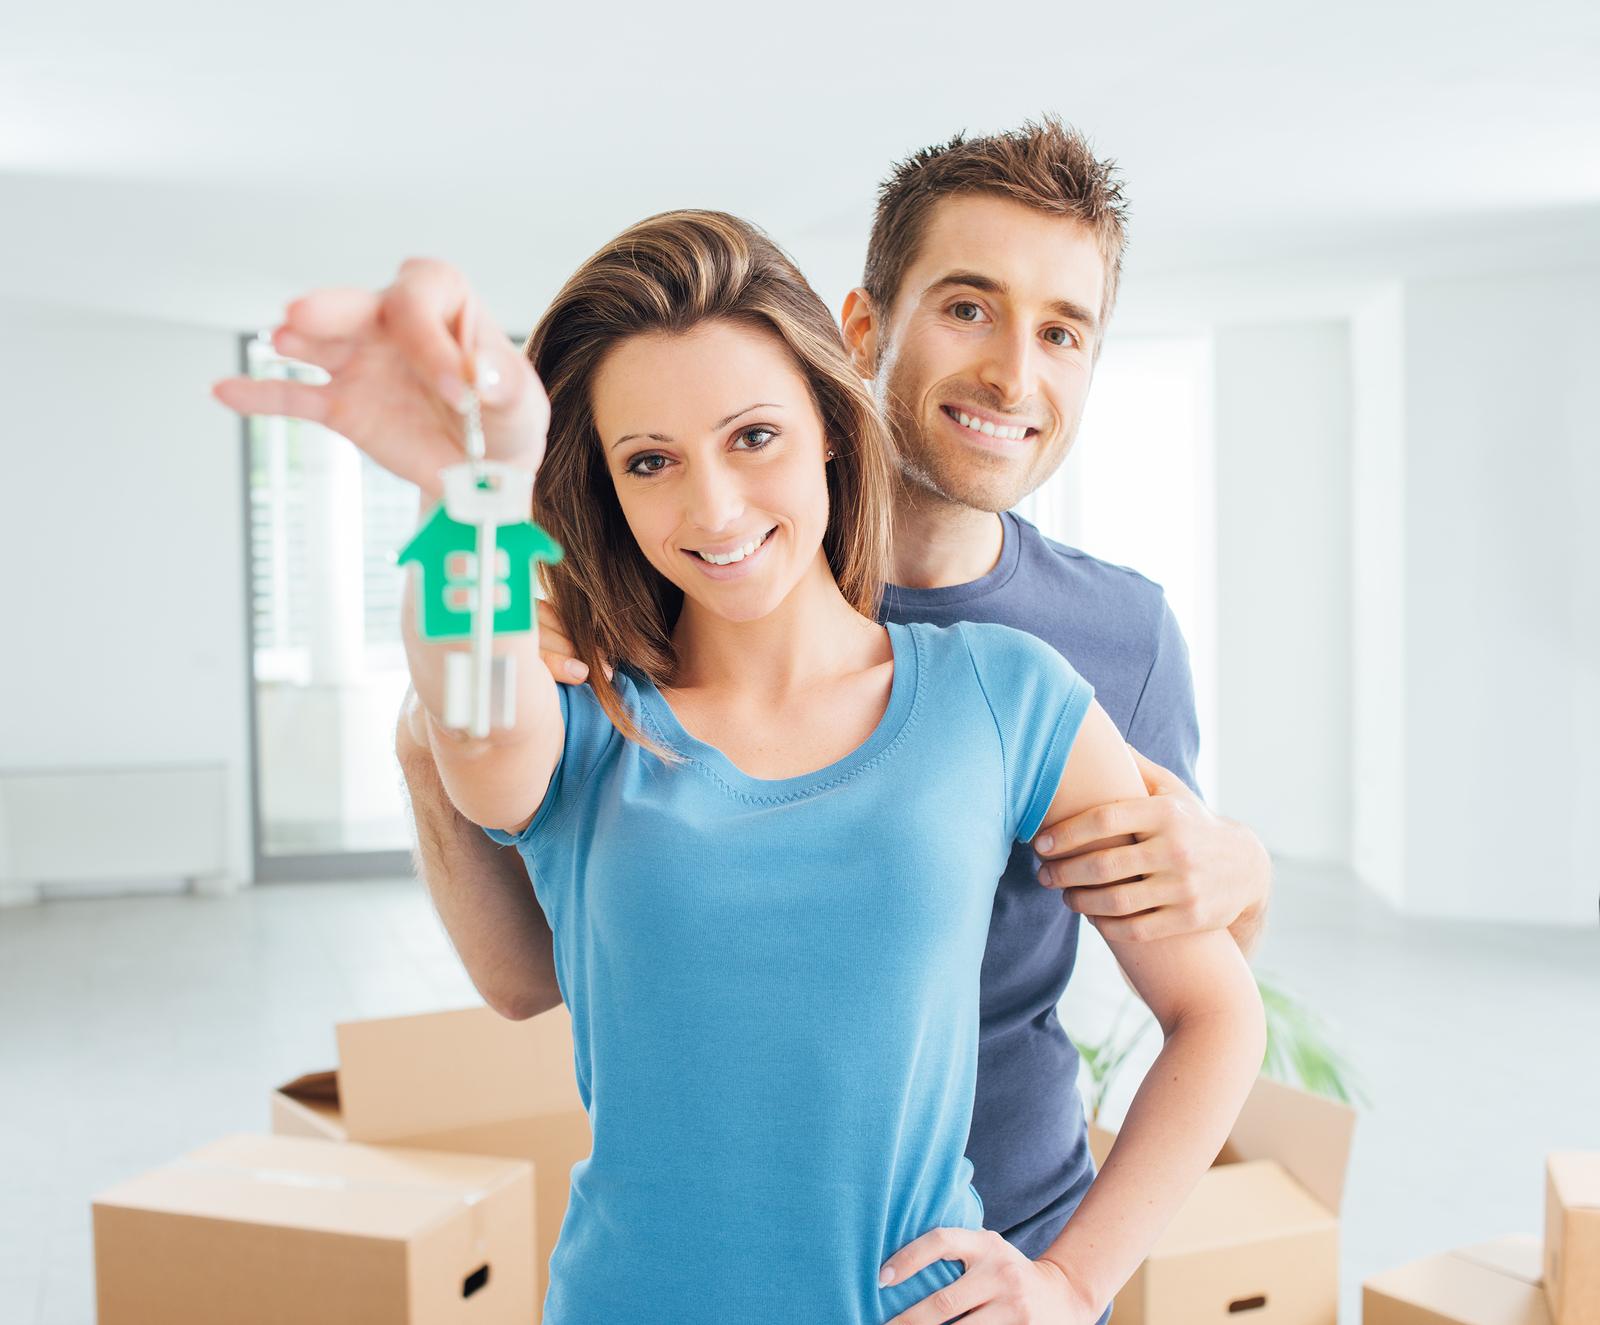 Os Millennials já pensam em adquirir imóveis